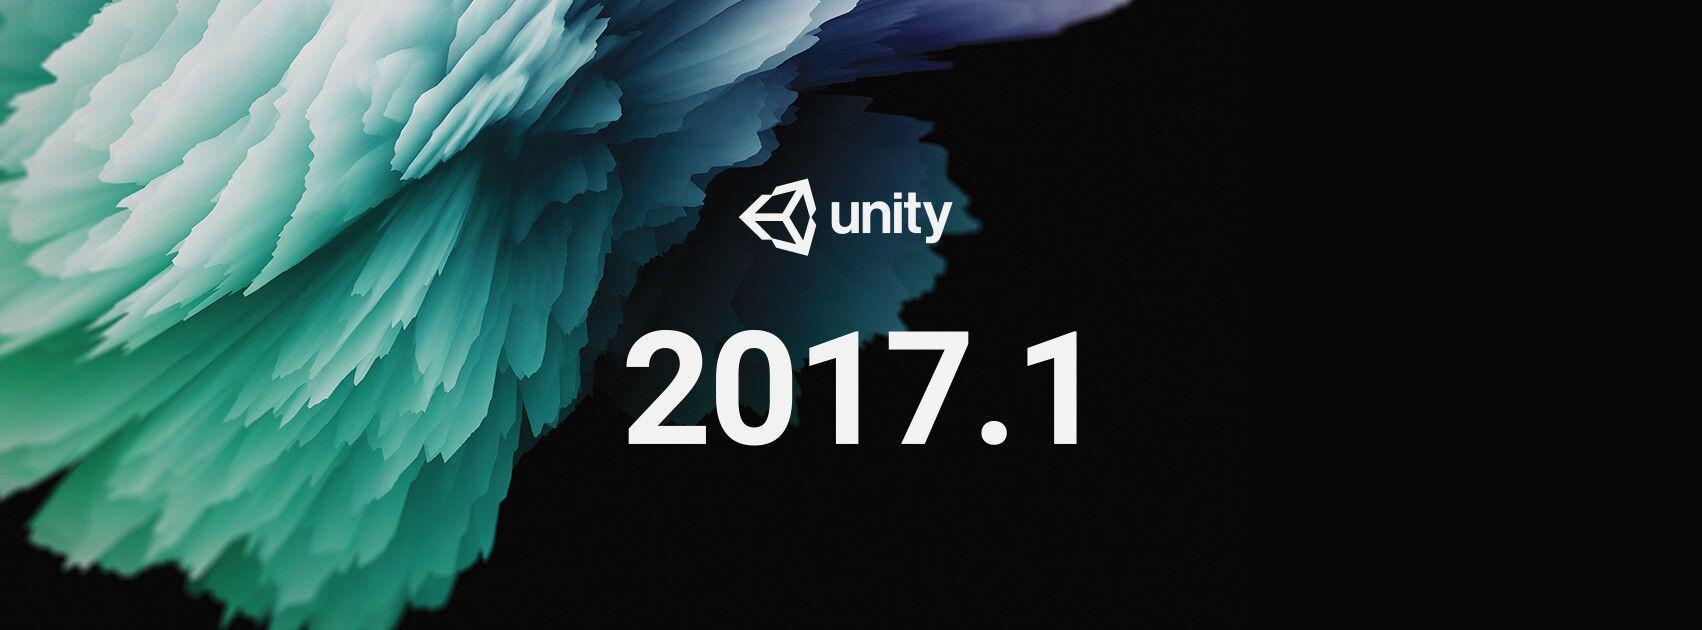 unity-2017.1_launch-fb-cover.jpg